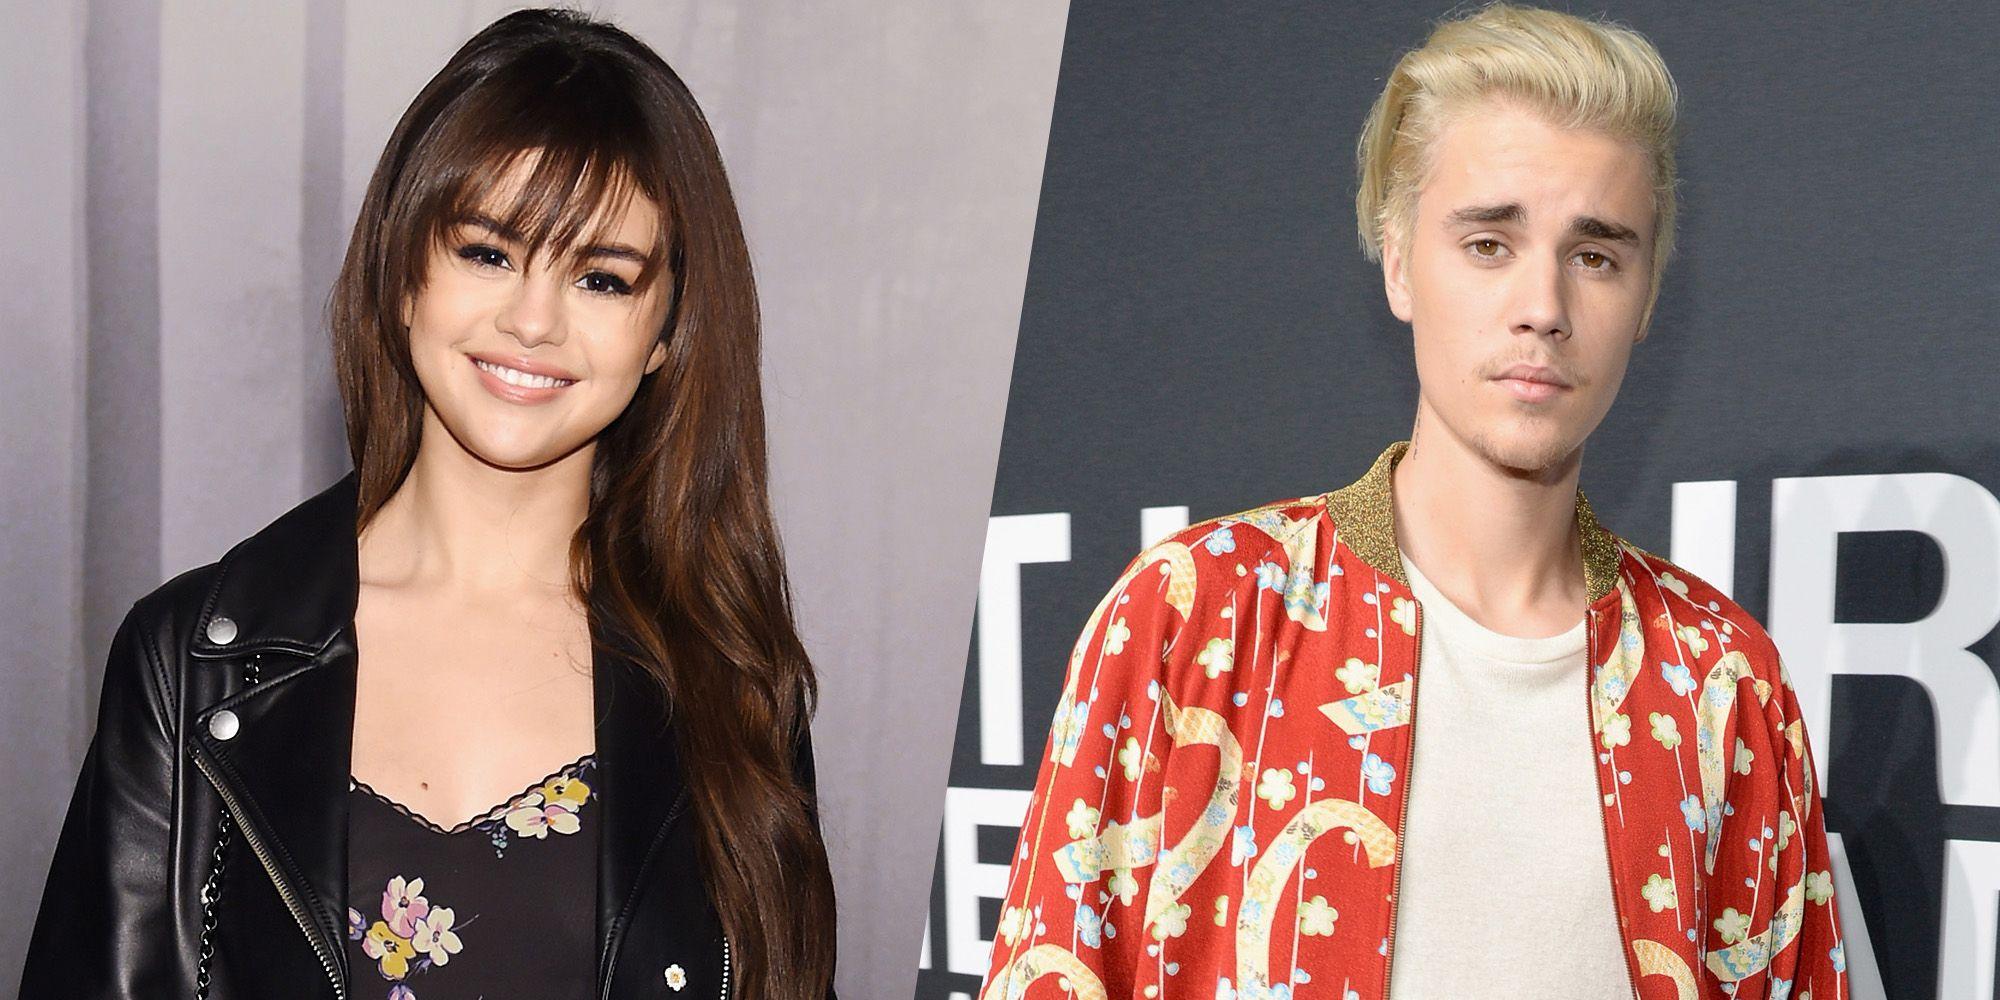 Who Is Selena Gomez Dating February 2018